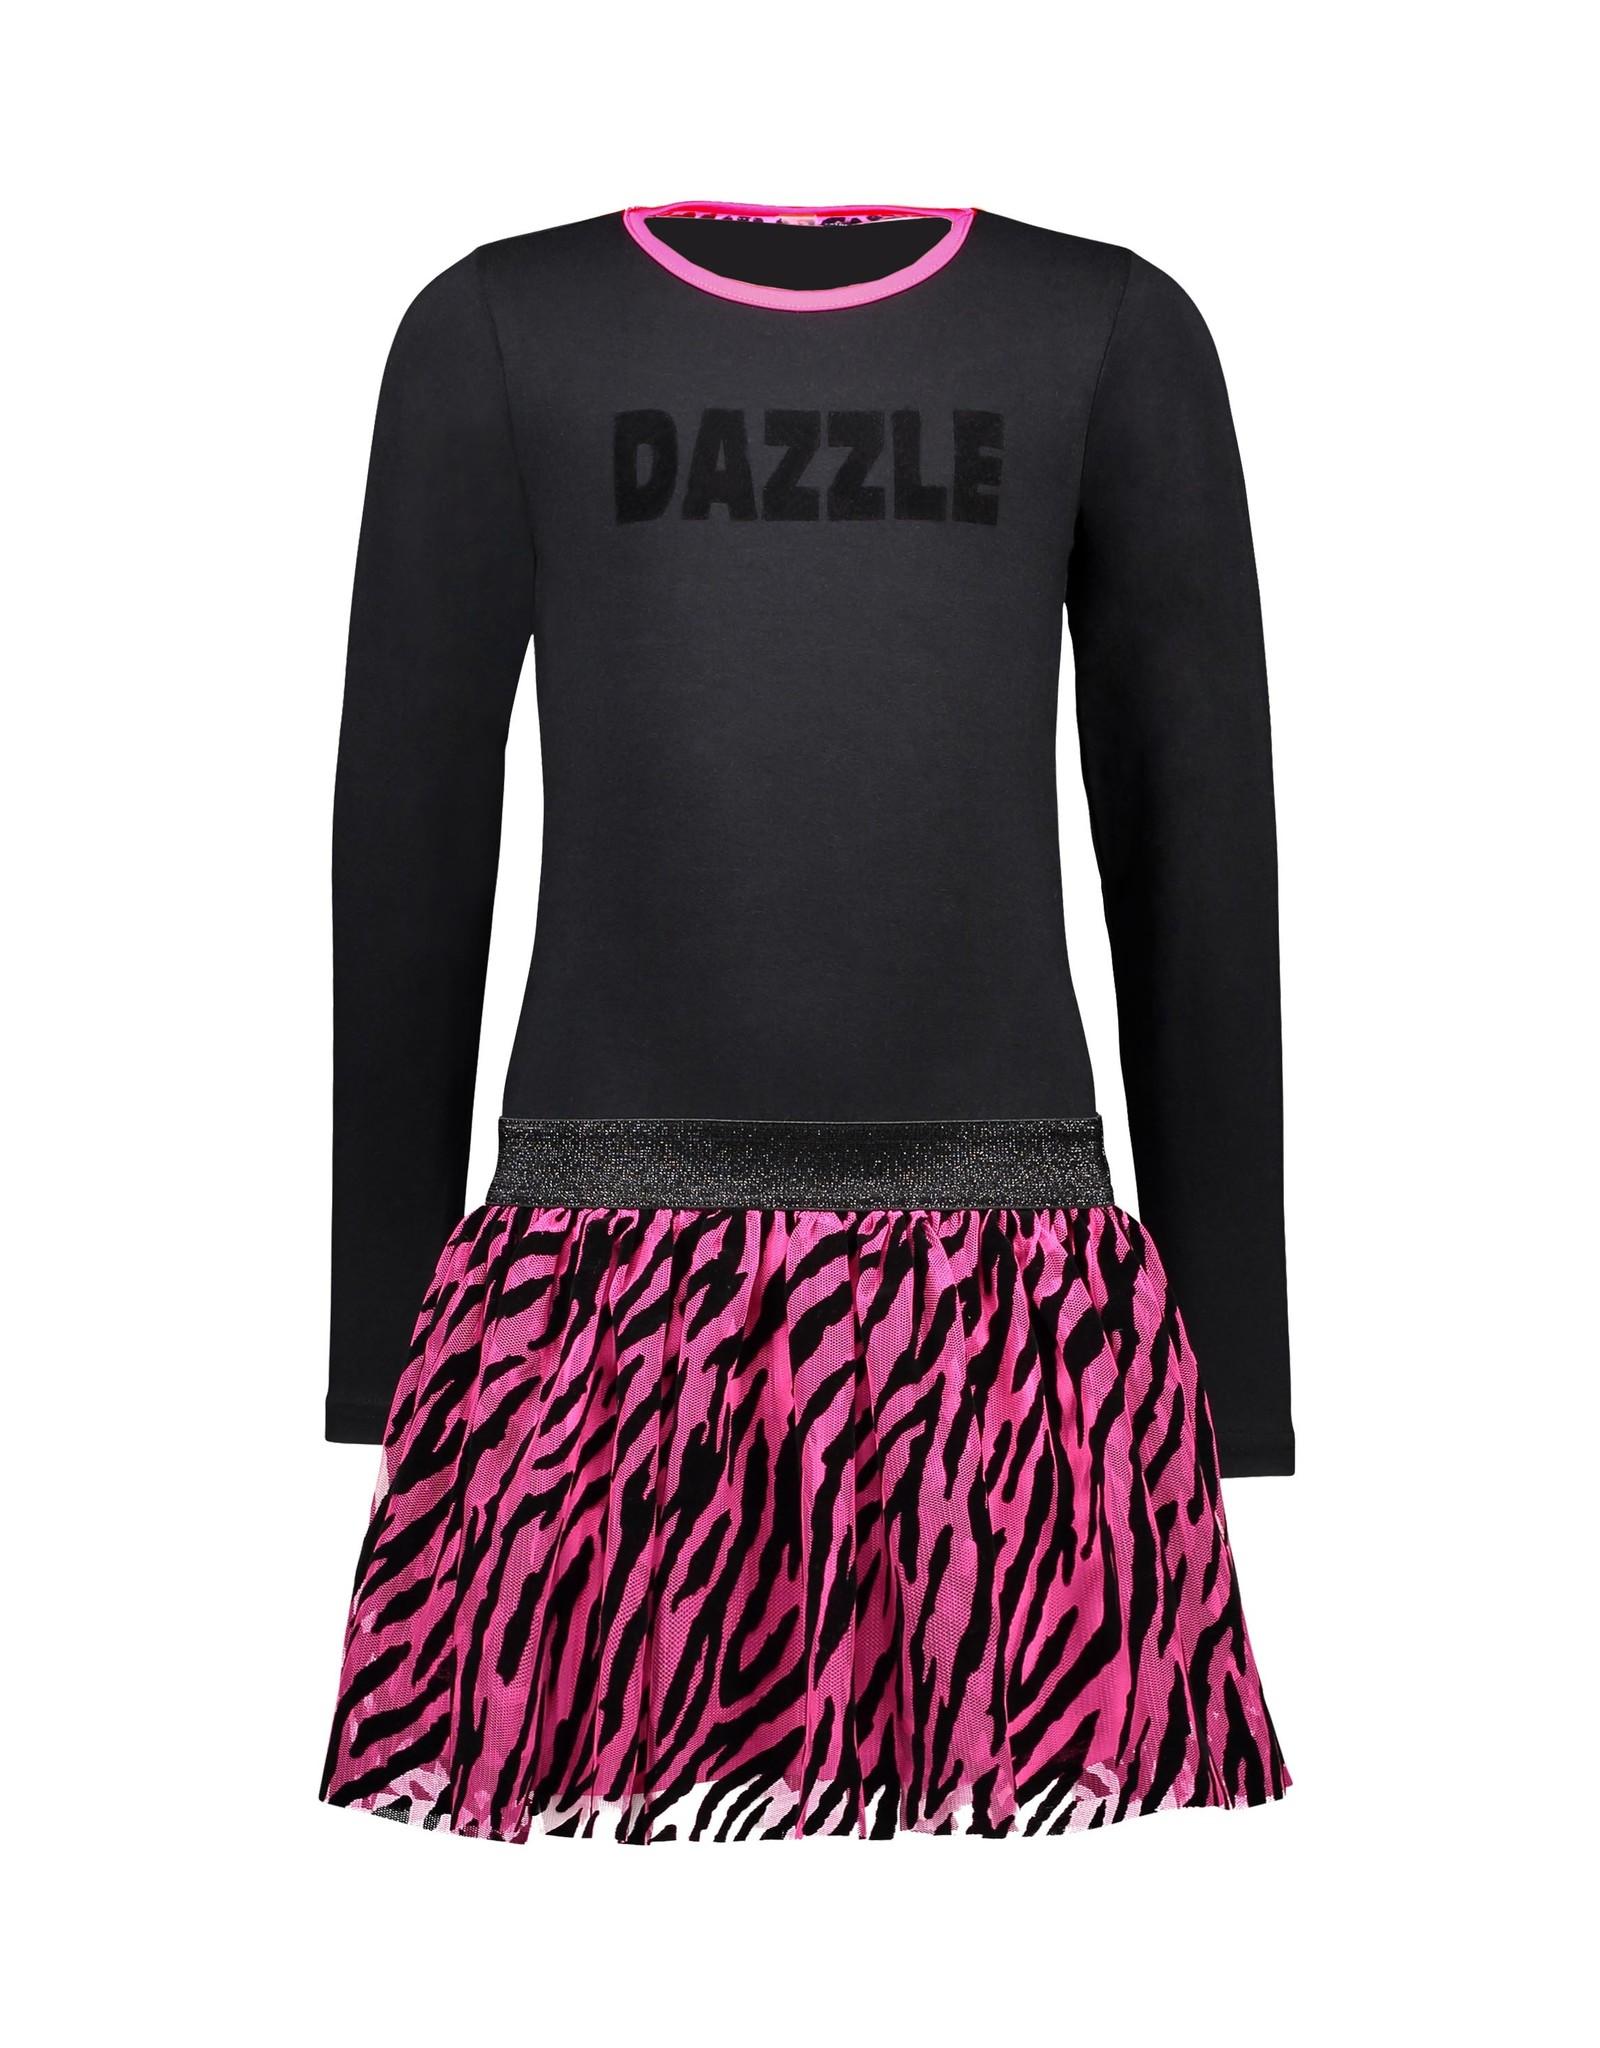 B-Nosy Girls dress with 2-layer mesh skirt with zebra flock aop, Black